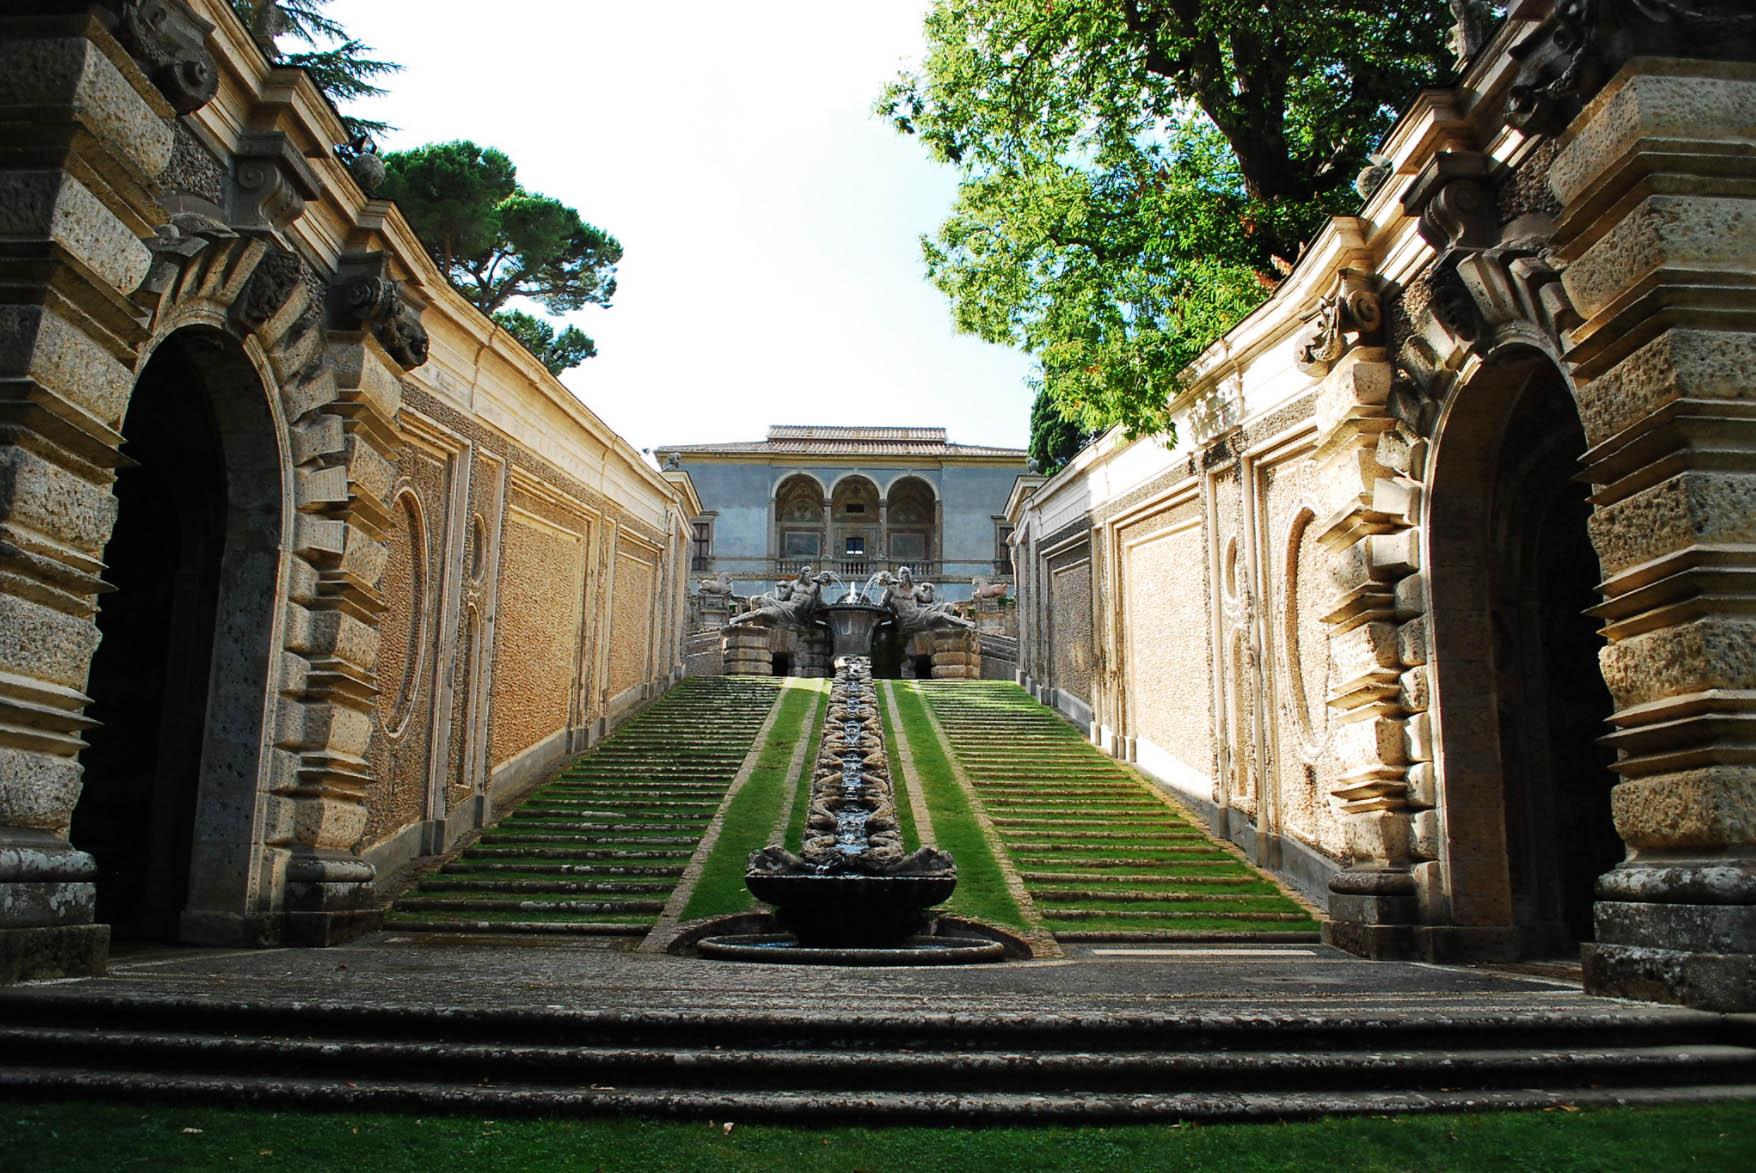 Jardins - Palais Farnèse - Caprarola - Circuits en voiture Latium